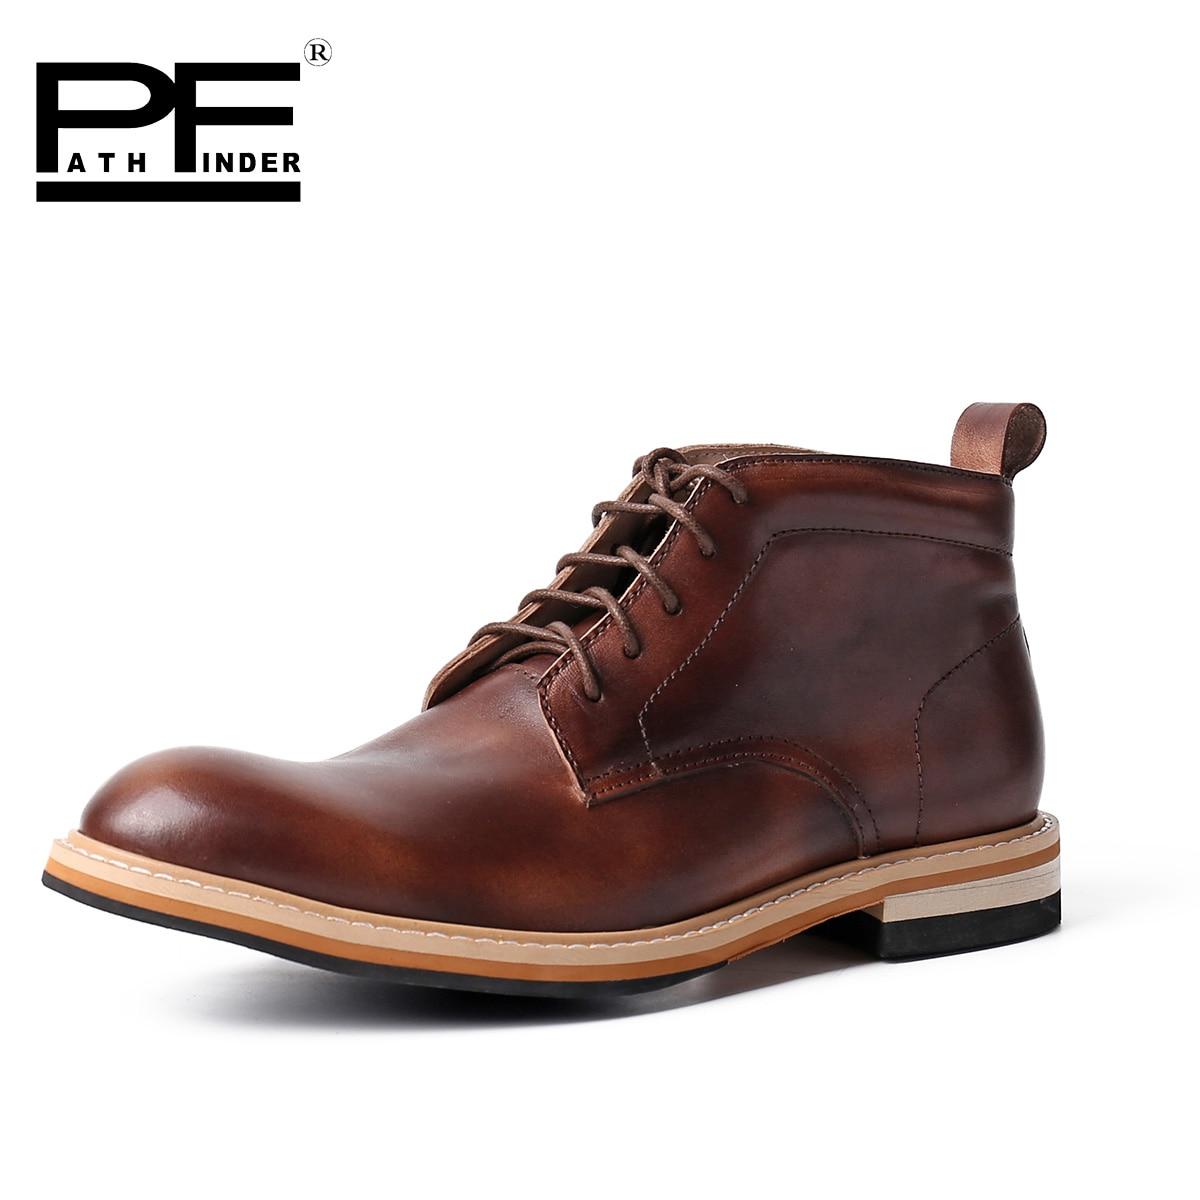 Pathfinder 2016 British Classic Dress Botas Men Leather Oxfords Shoes Original Brand font b Cowboy b